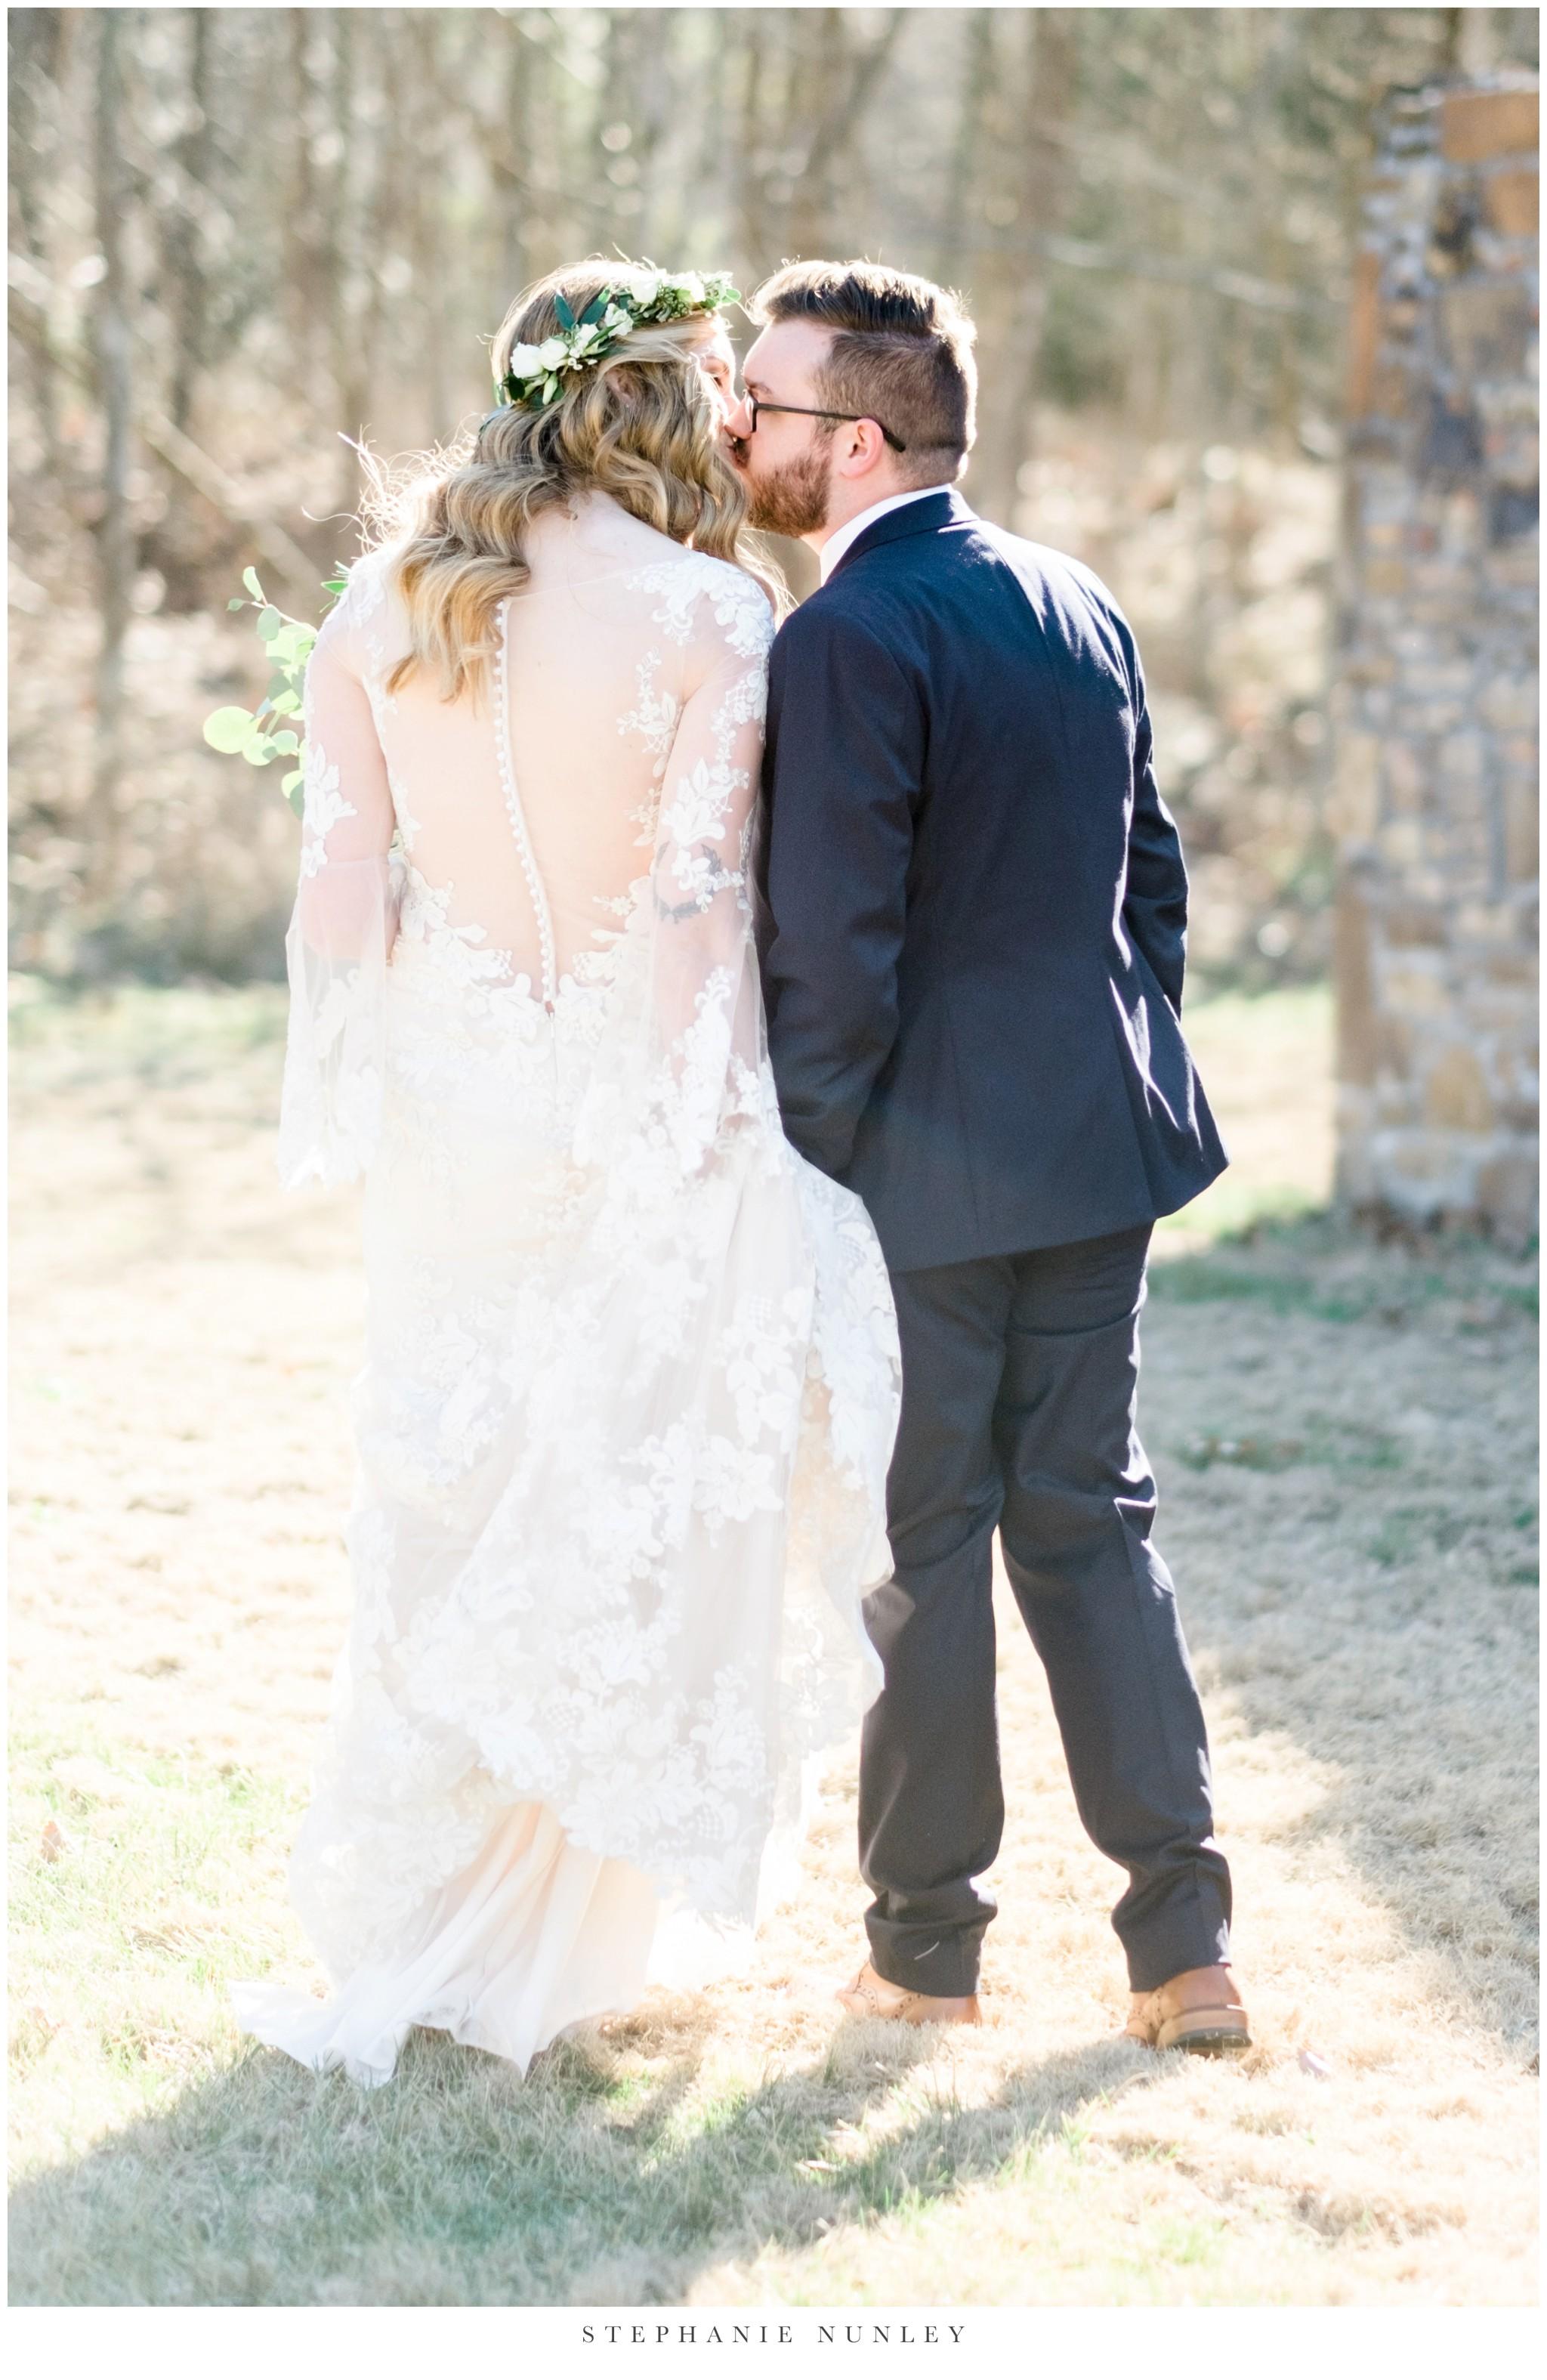 sassafrass-springs-vineyard-film-wedding-photos-35.jpg